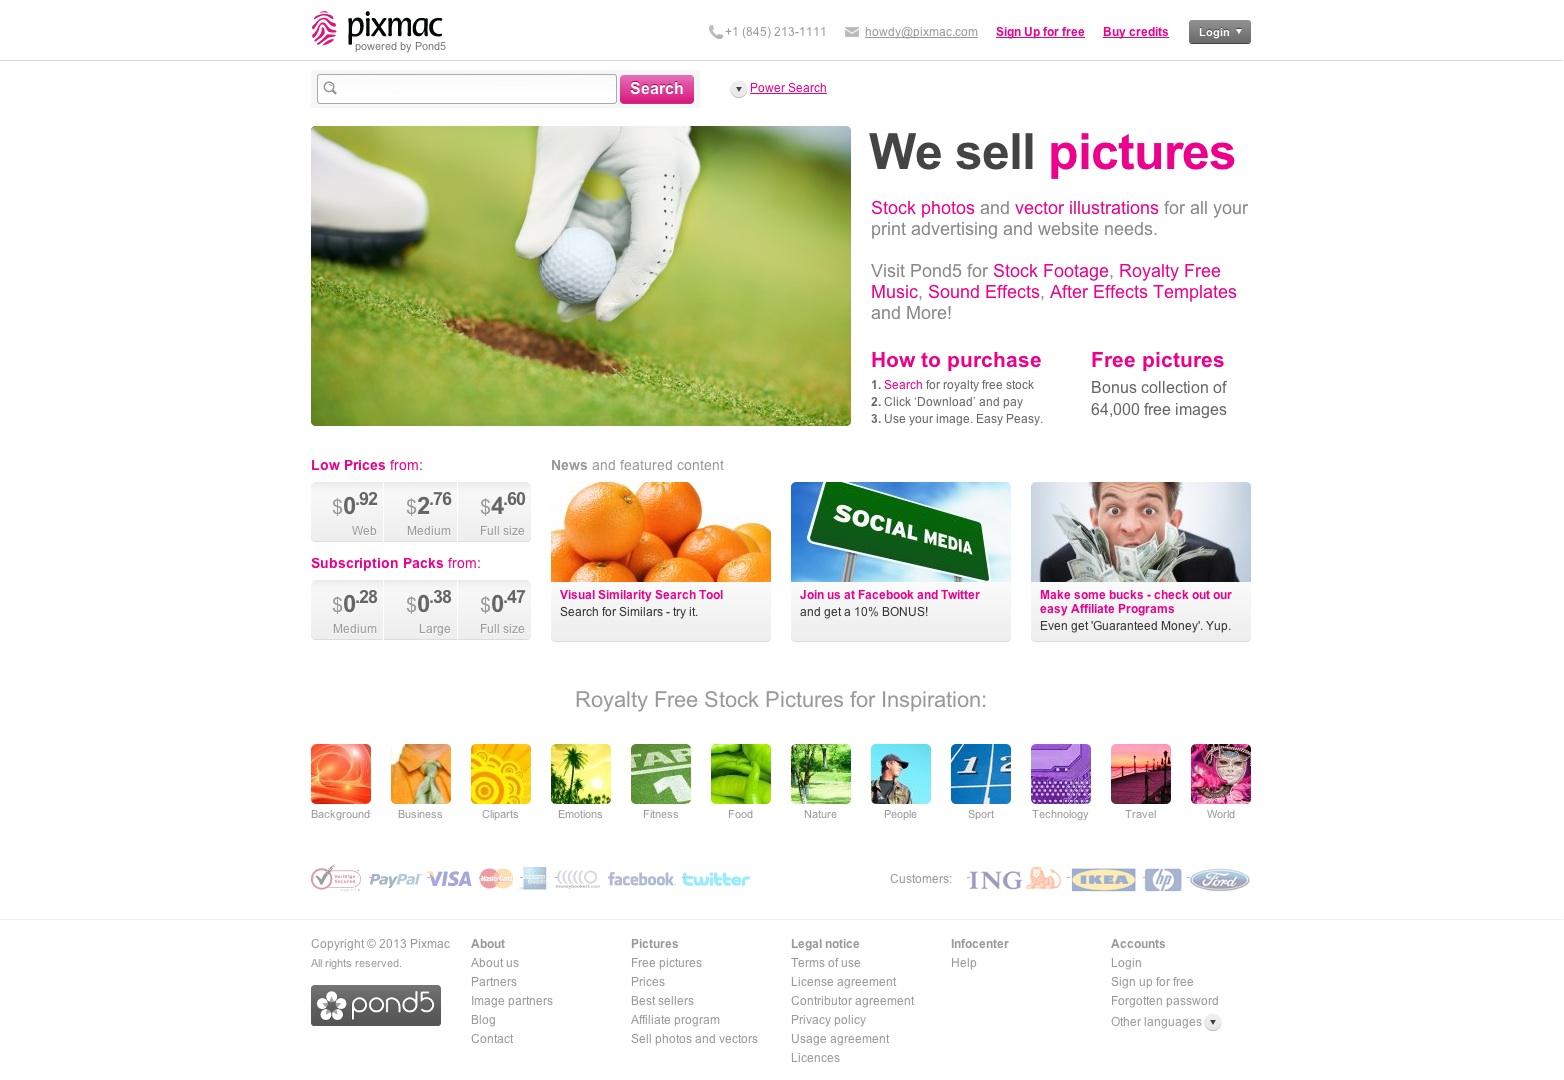 Buy-stock-photos-vectors-royalty-free-pictures-Pixmac.jpg